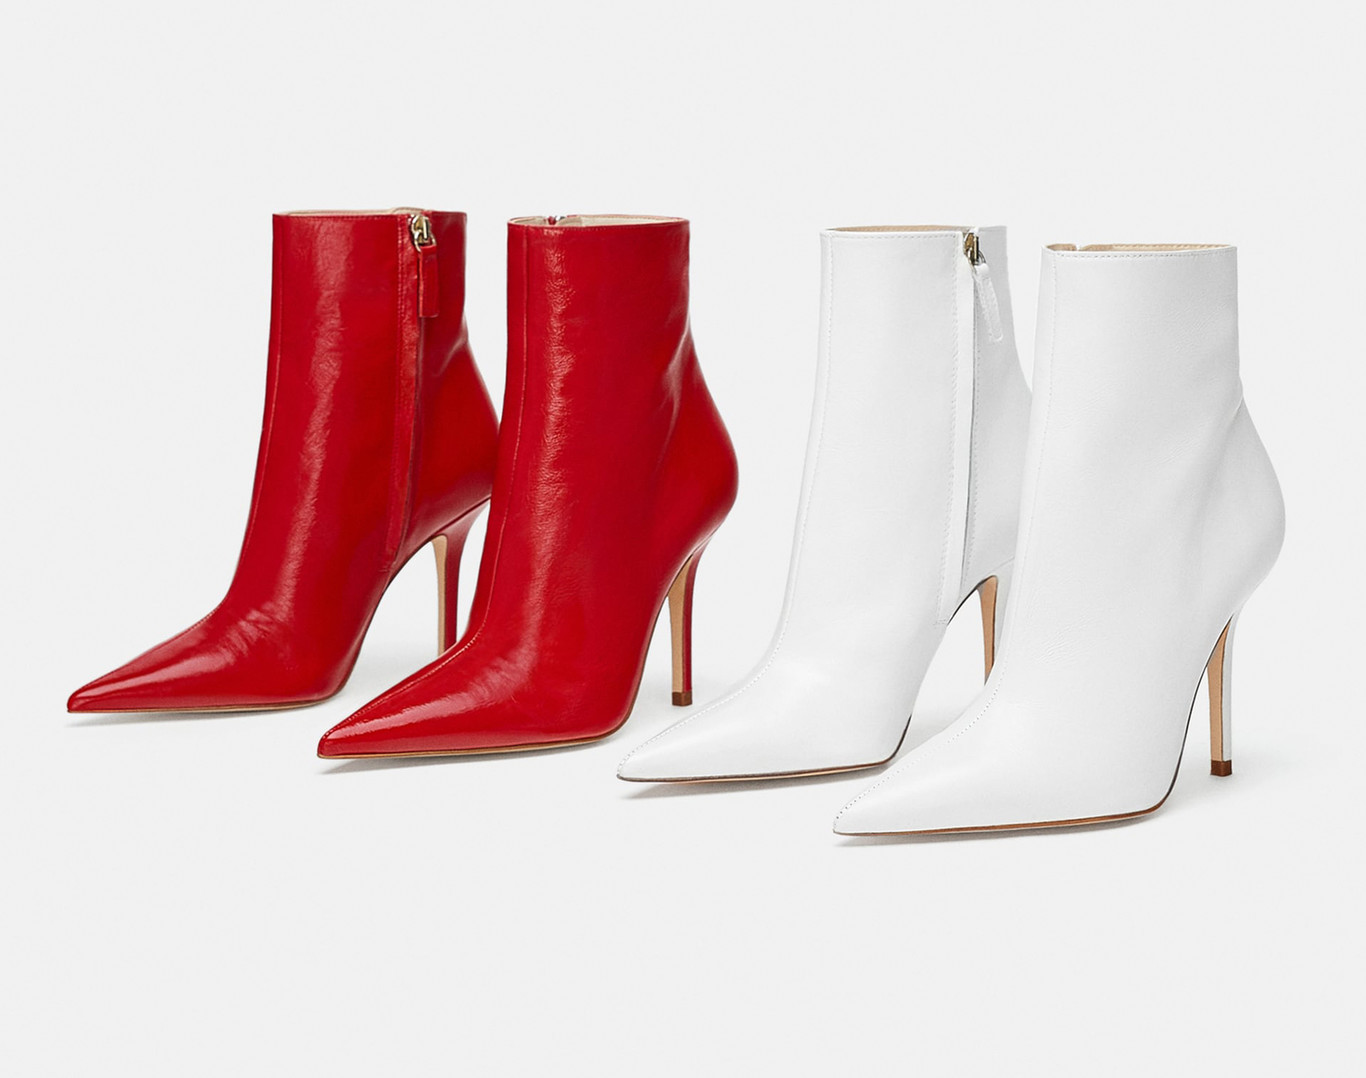 f0b110b04 29 zapatos de Zara que son tendencia esta temporada Otoño-Invierno 2018 2019